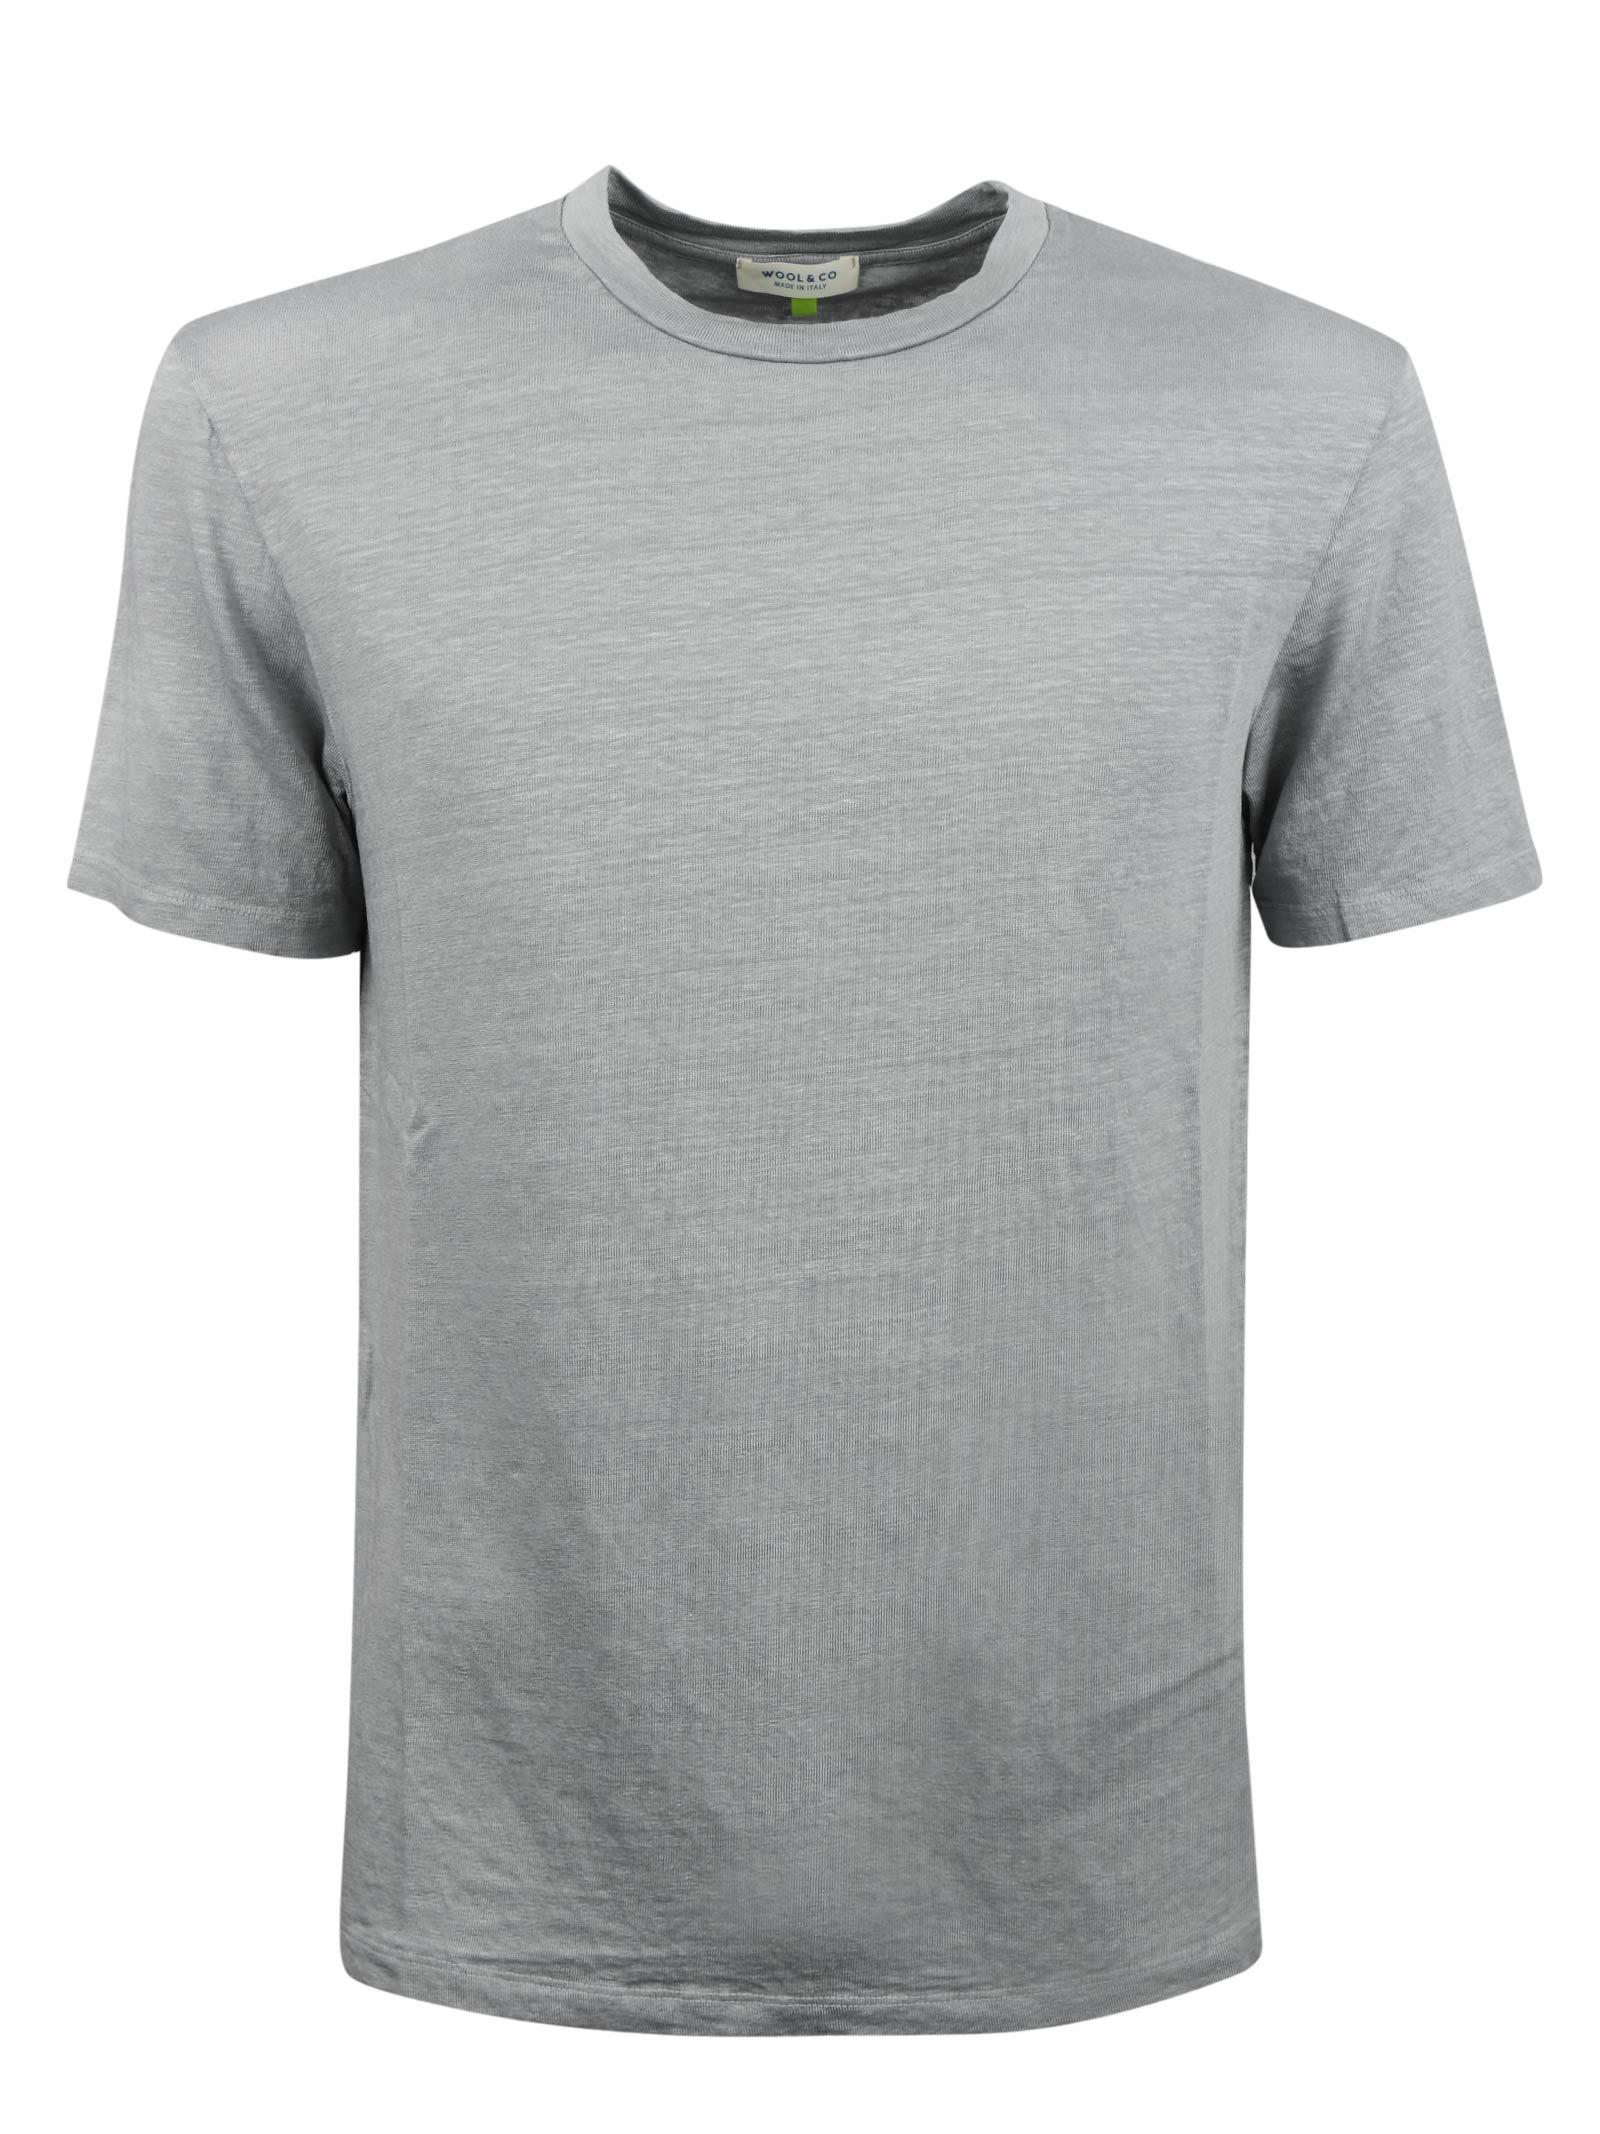 WOOL & CO. | T-shirts | 23800911